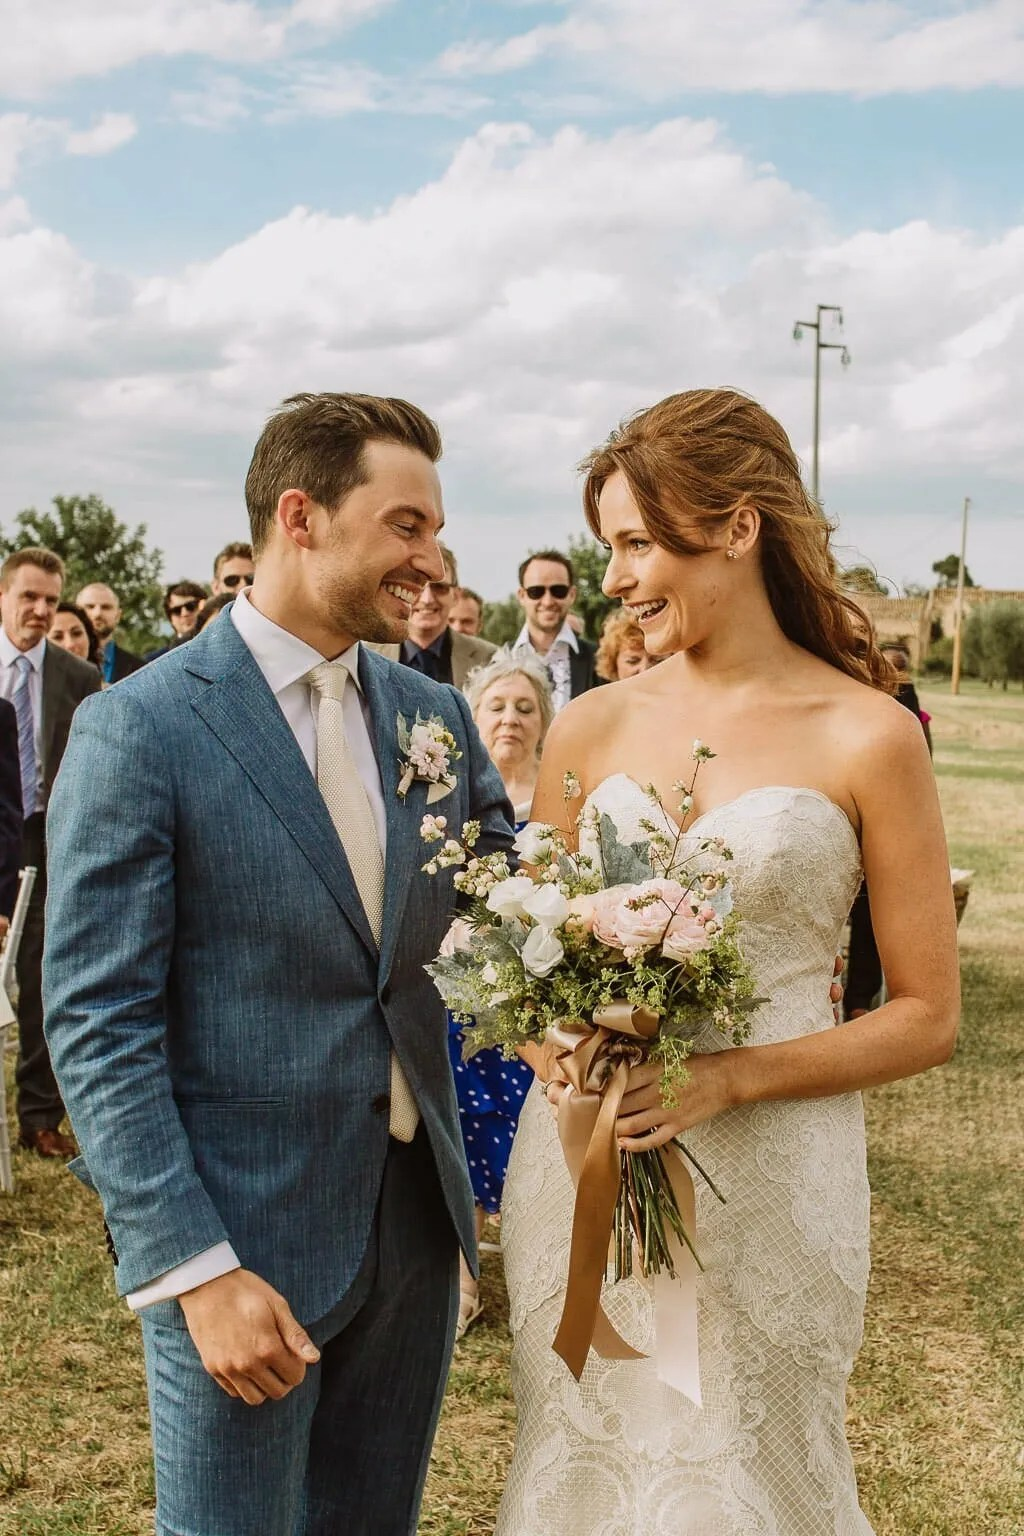 matera-italy-destination-wedding-fotografo-pietro-moliterni-30